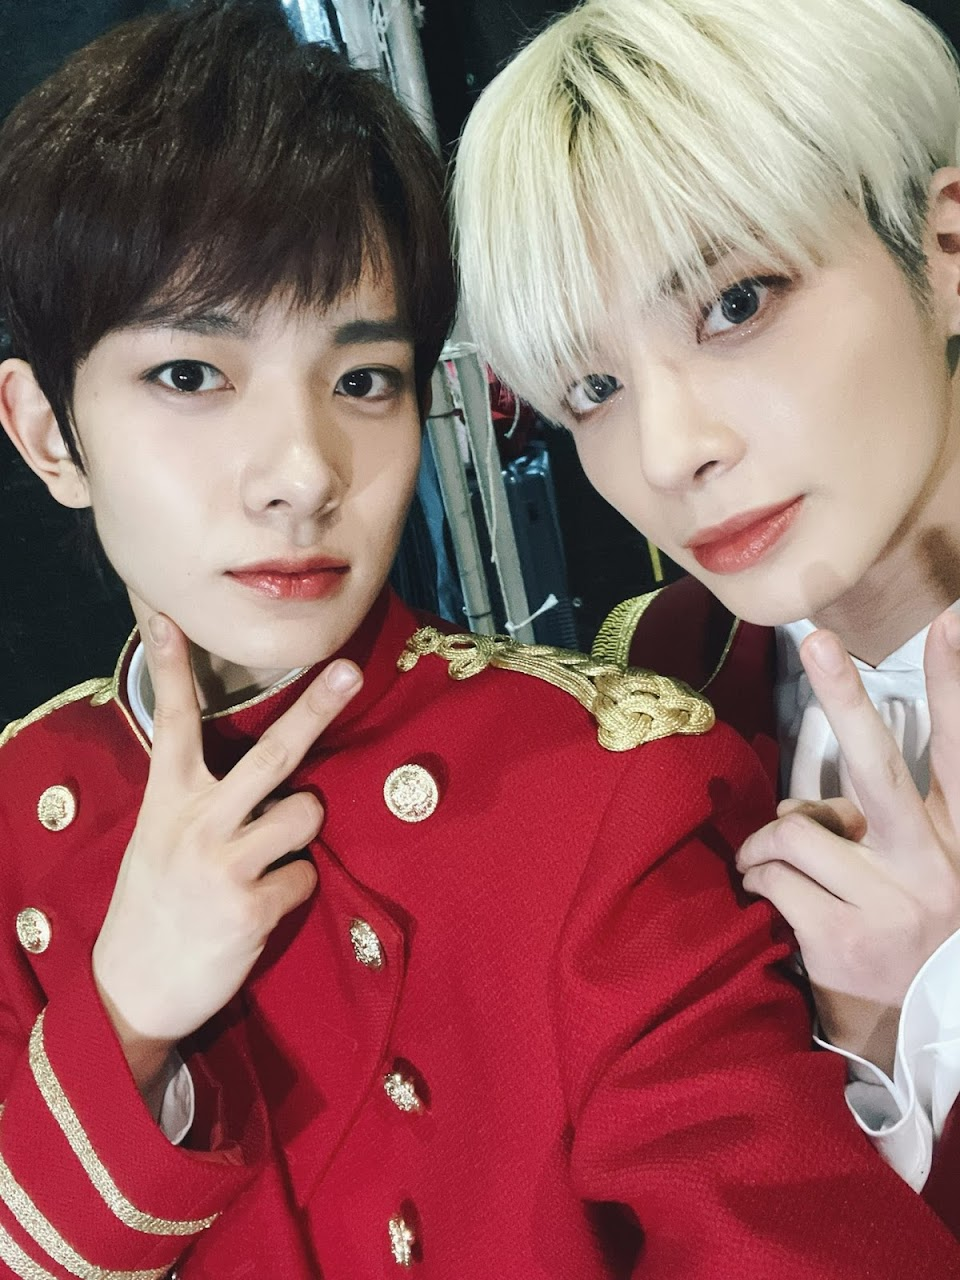 txt taehyun enhypen heeseung @ENHYPEN_members 1